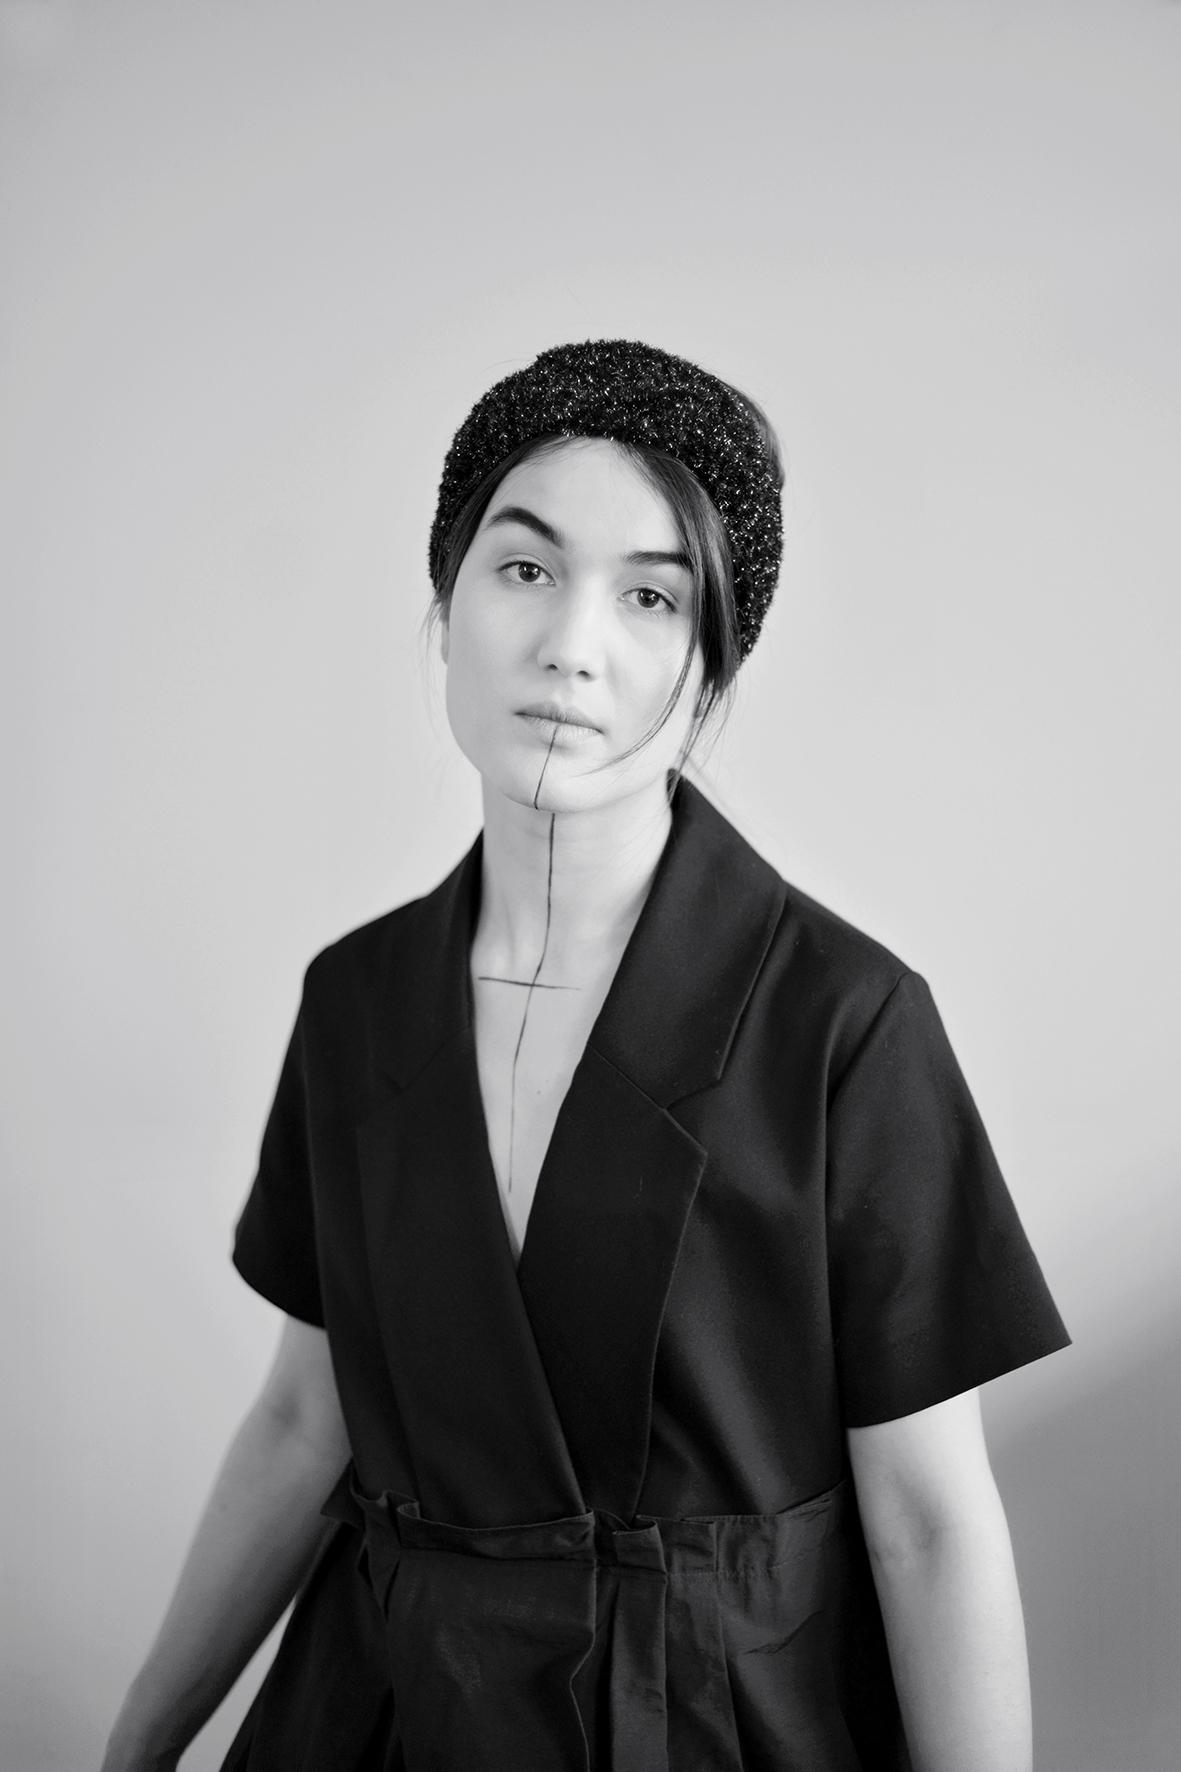 Julie Coustarot, Nini Peony